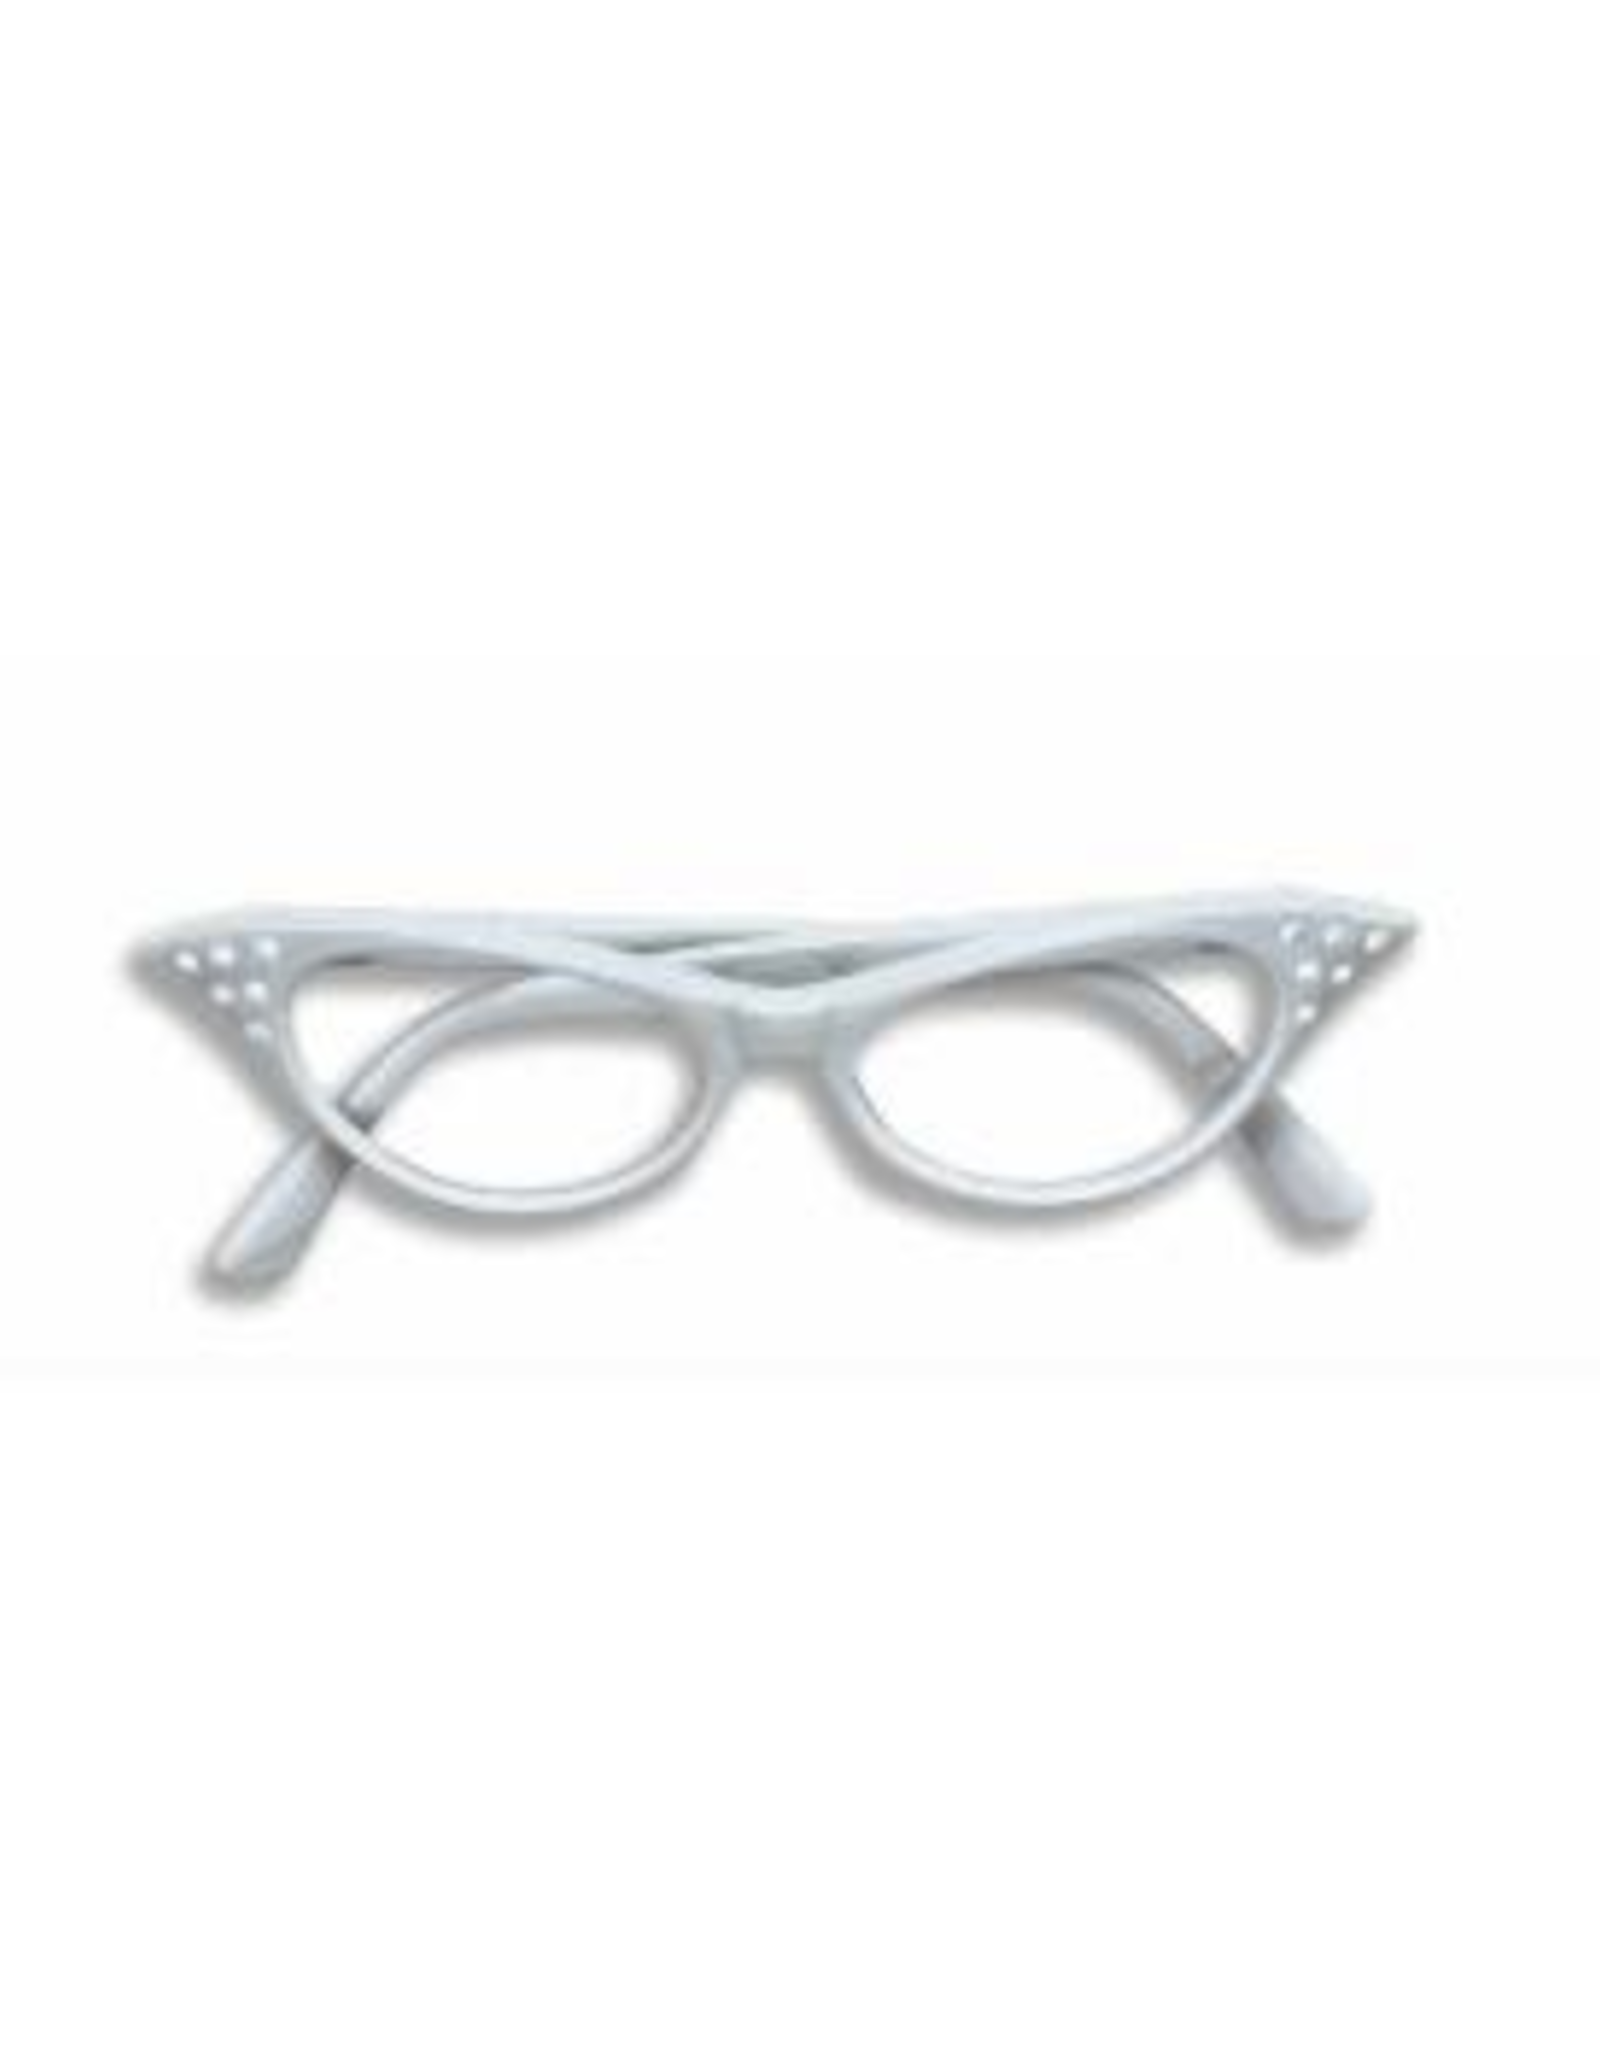 GLASSES-50'S RHINESTONE<br />CLEAR LENS, WHITE